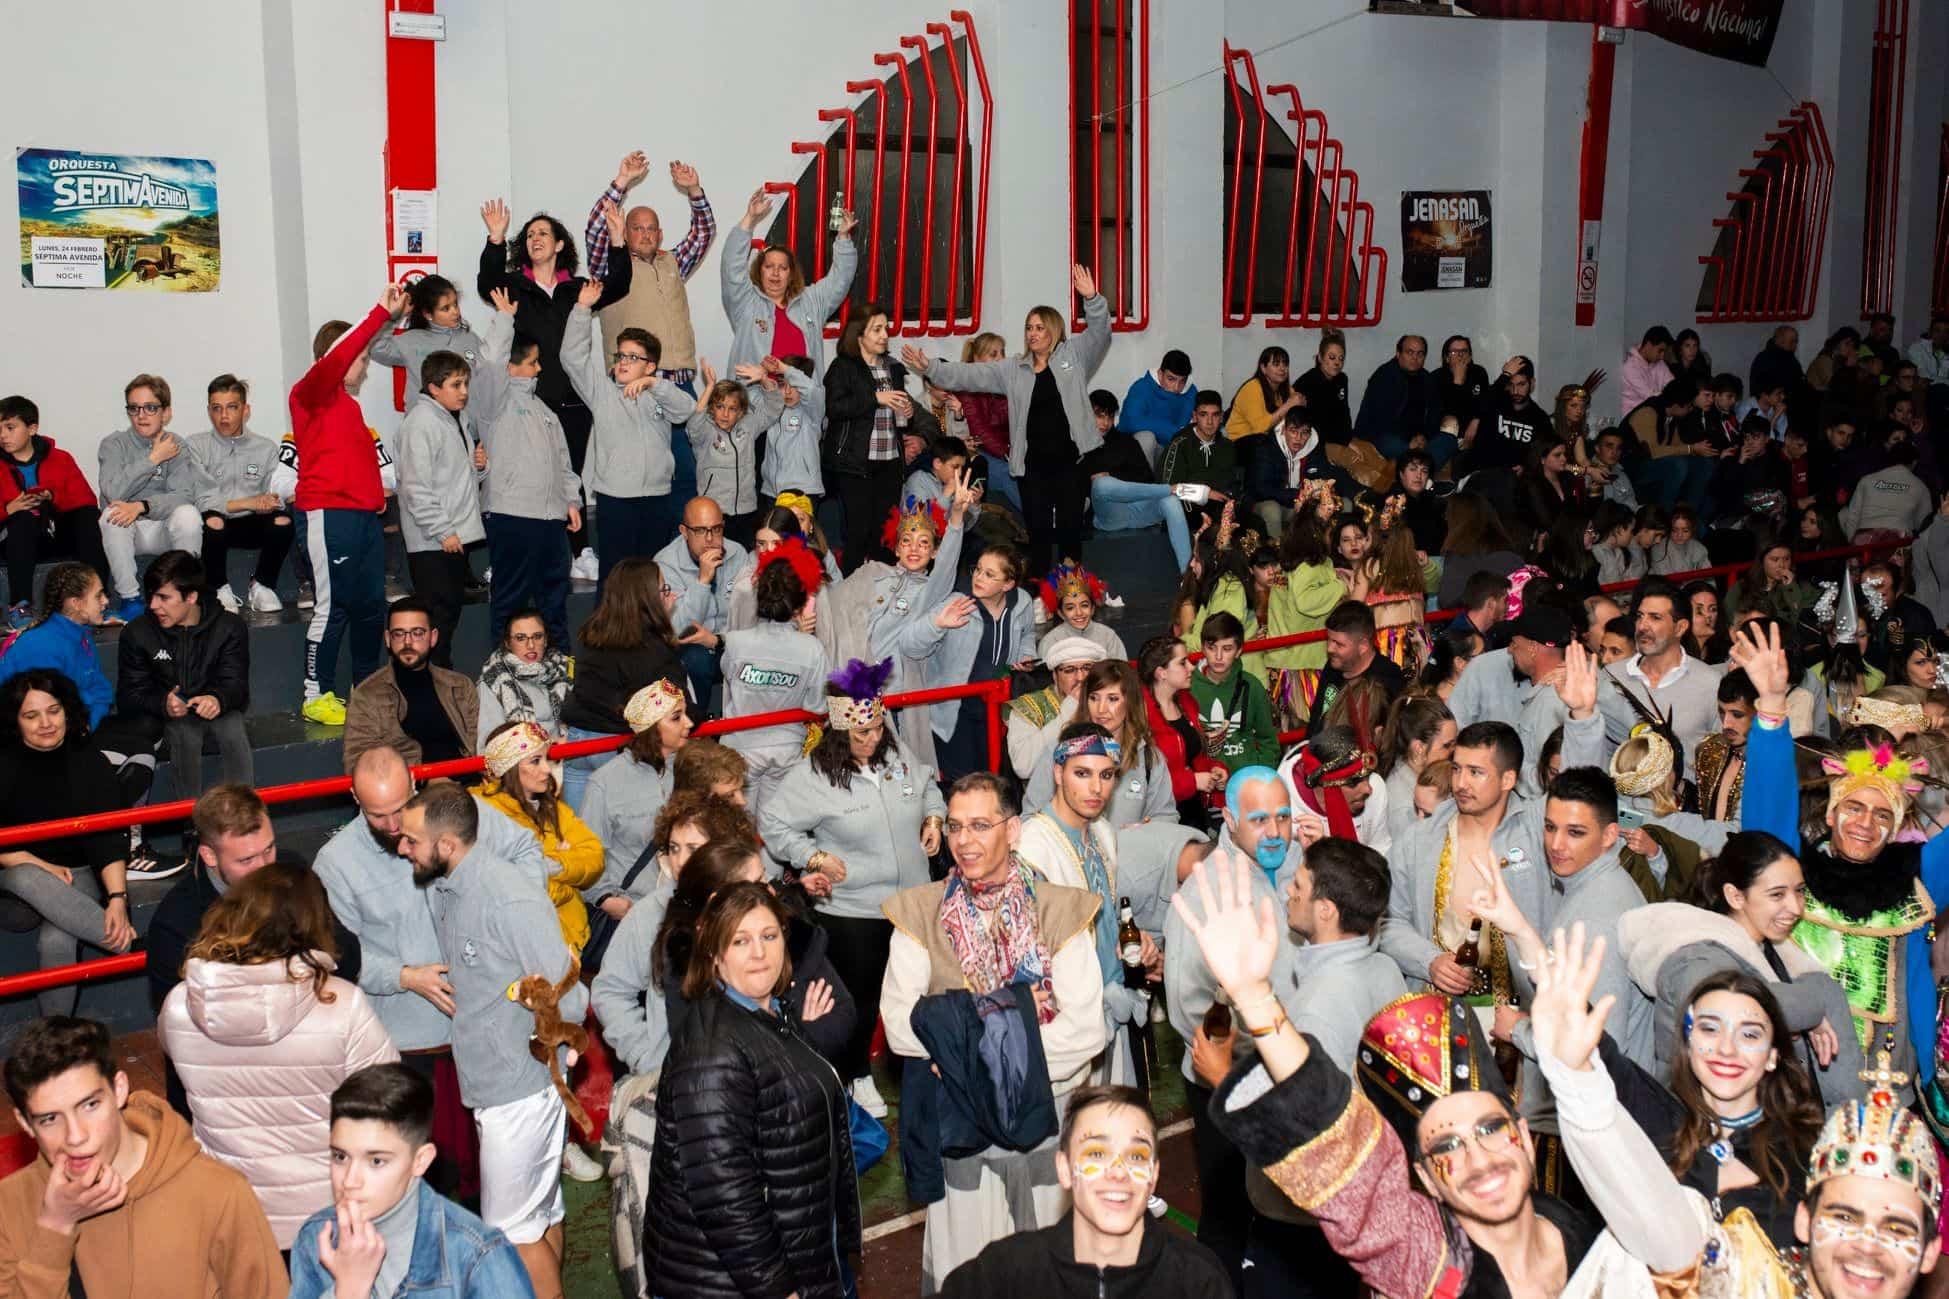 Carnaval de herencia 2020 ofertorio 68 - Selección de fotografías del Ofertorio del Carnaval de Herencia